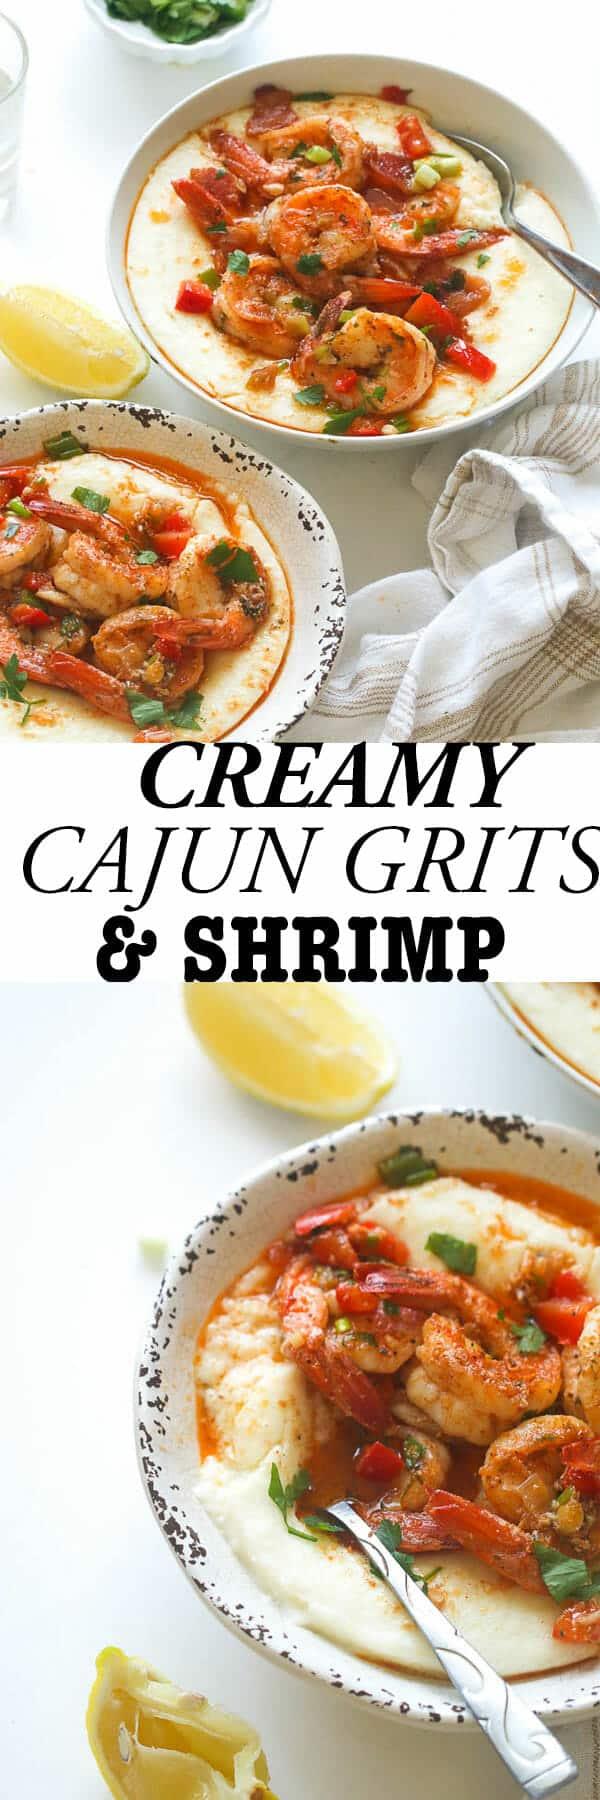 Creamy Cajun Grits & shrimp